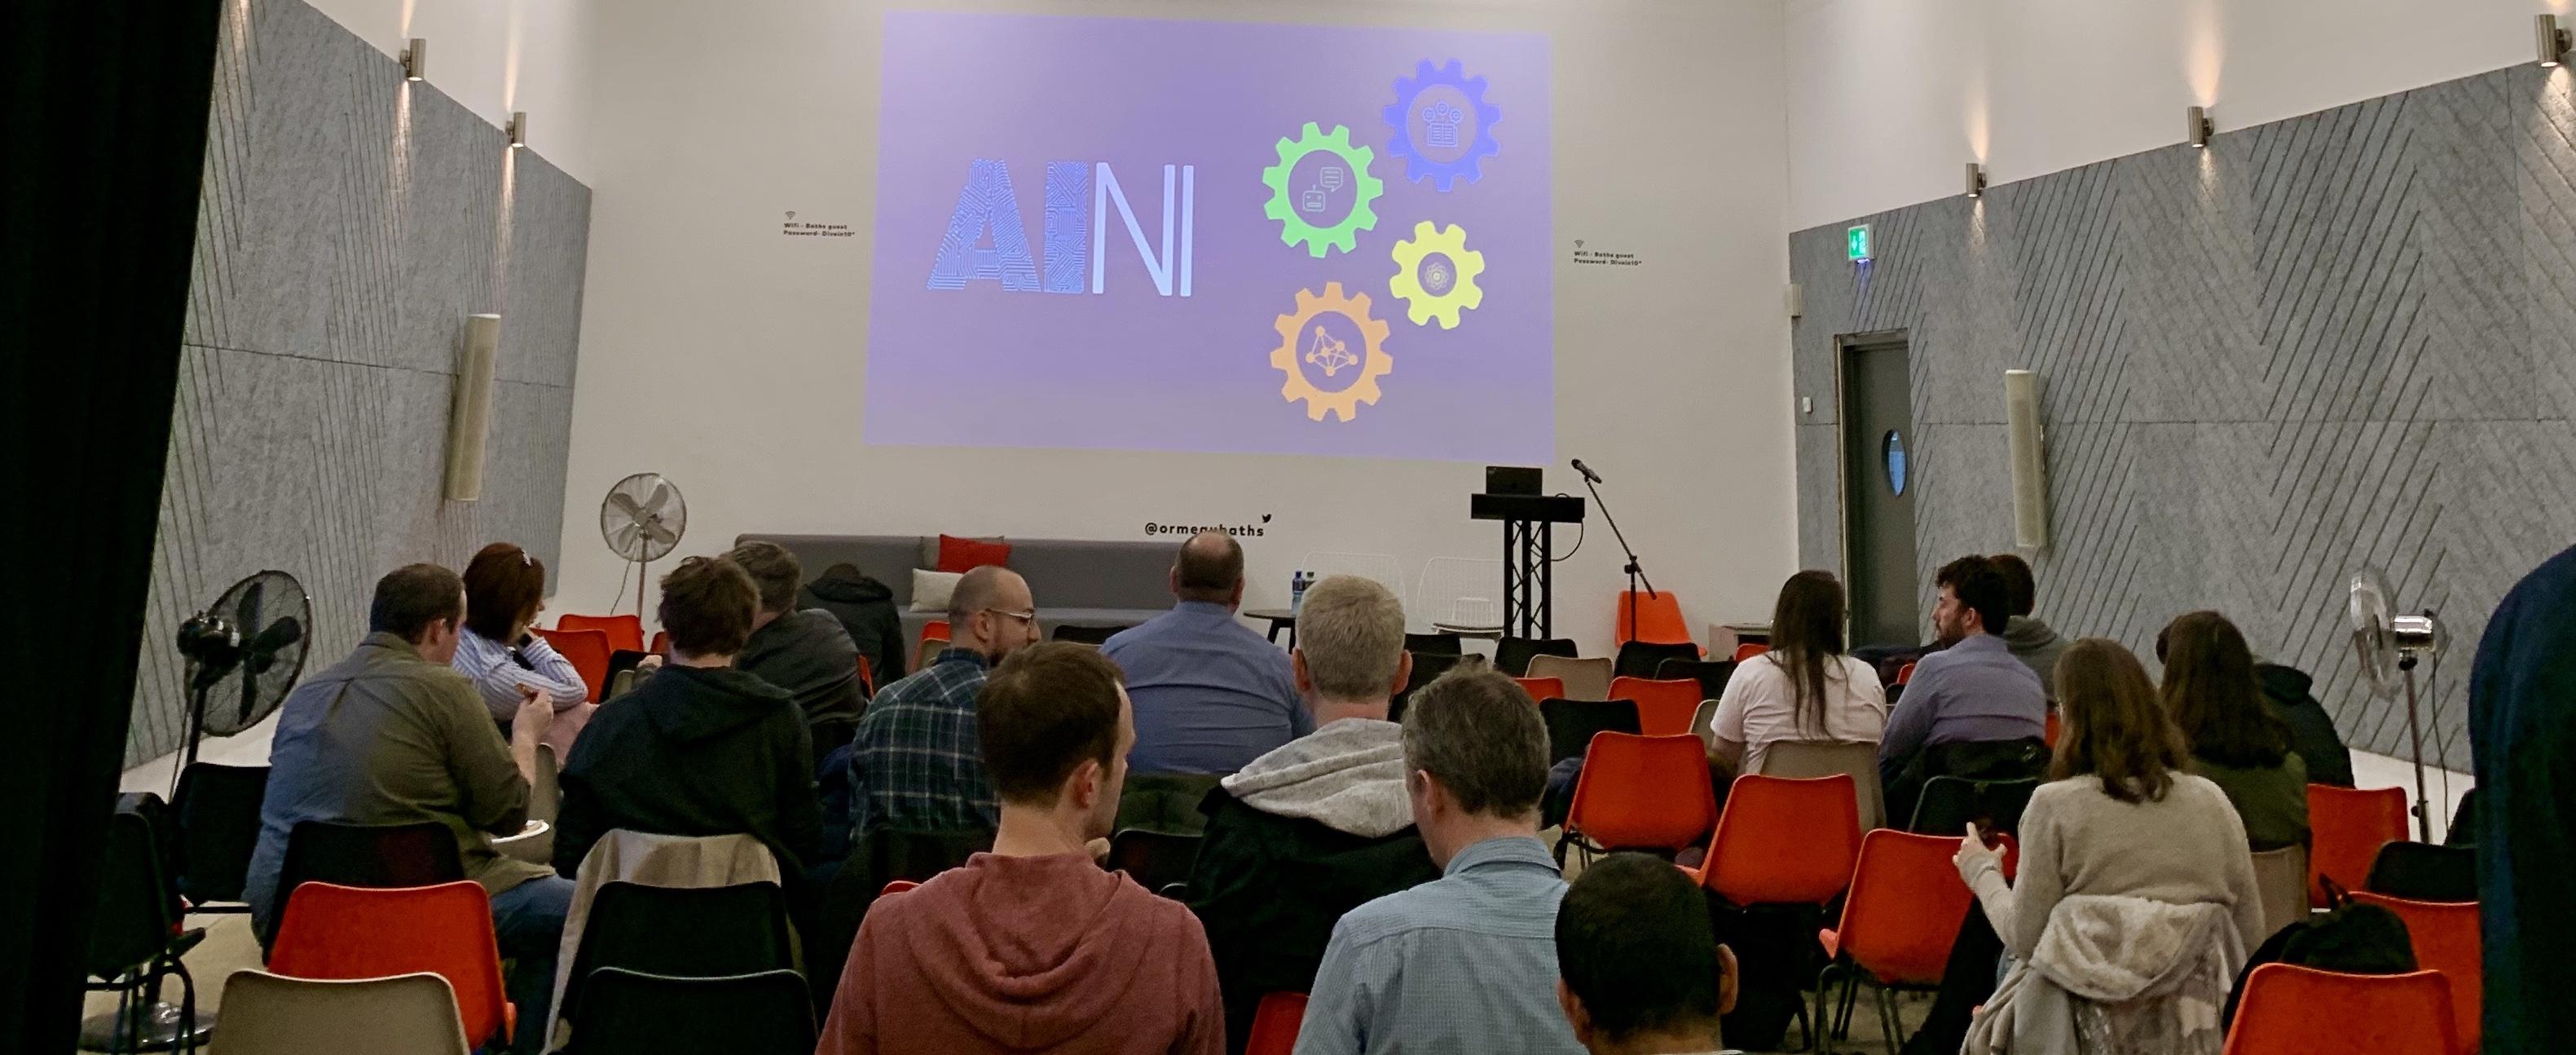 AI NI #8 – AI & VR, an Unexpected Alliance